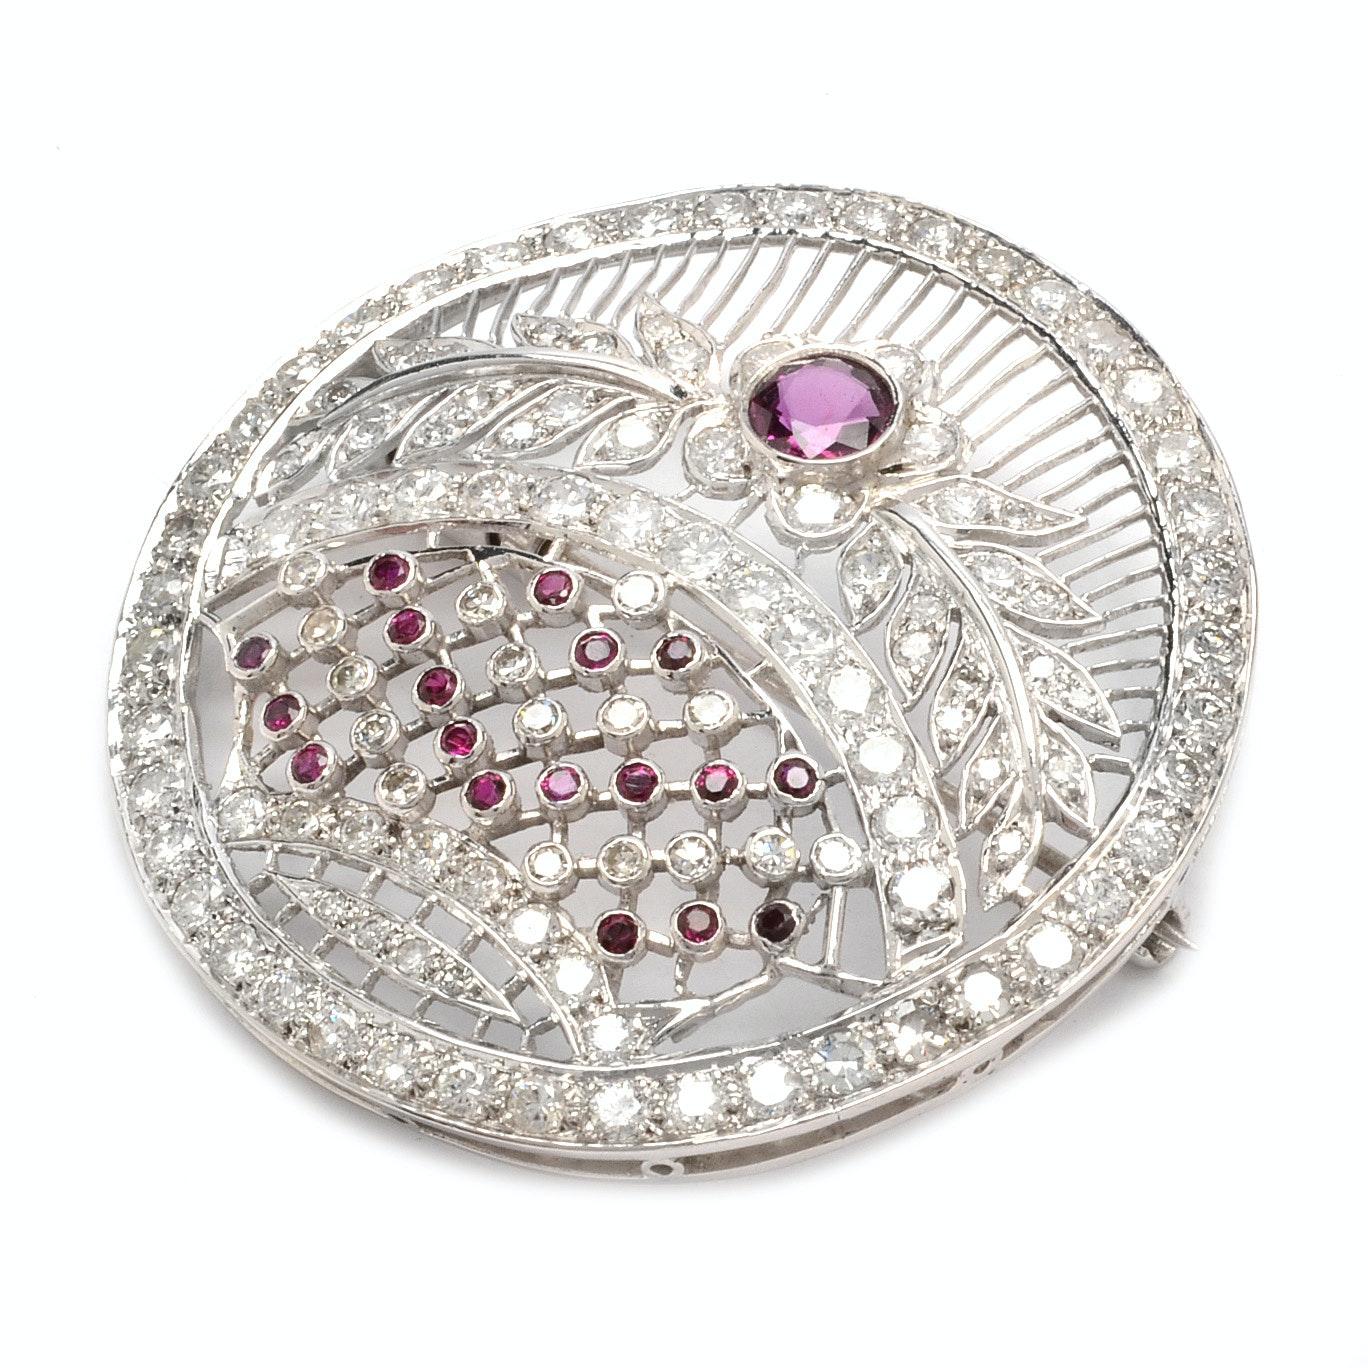 Belle Epoque Platinum 2.81 CTW Diamond and Ruby Brooch